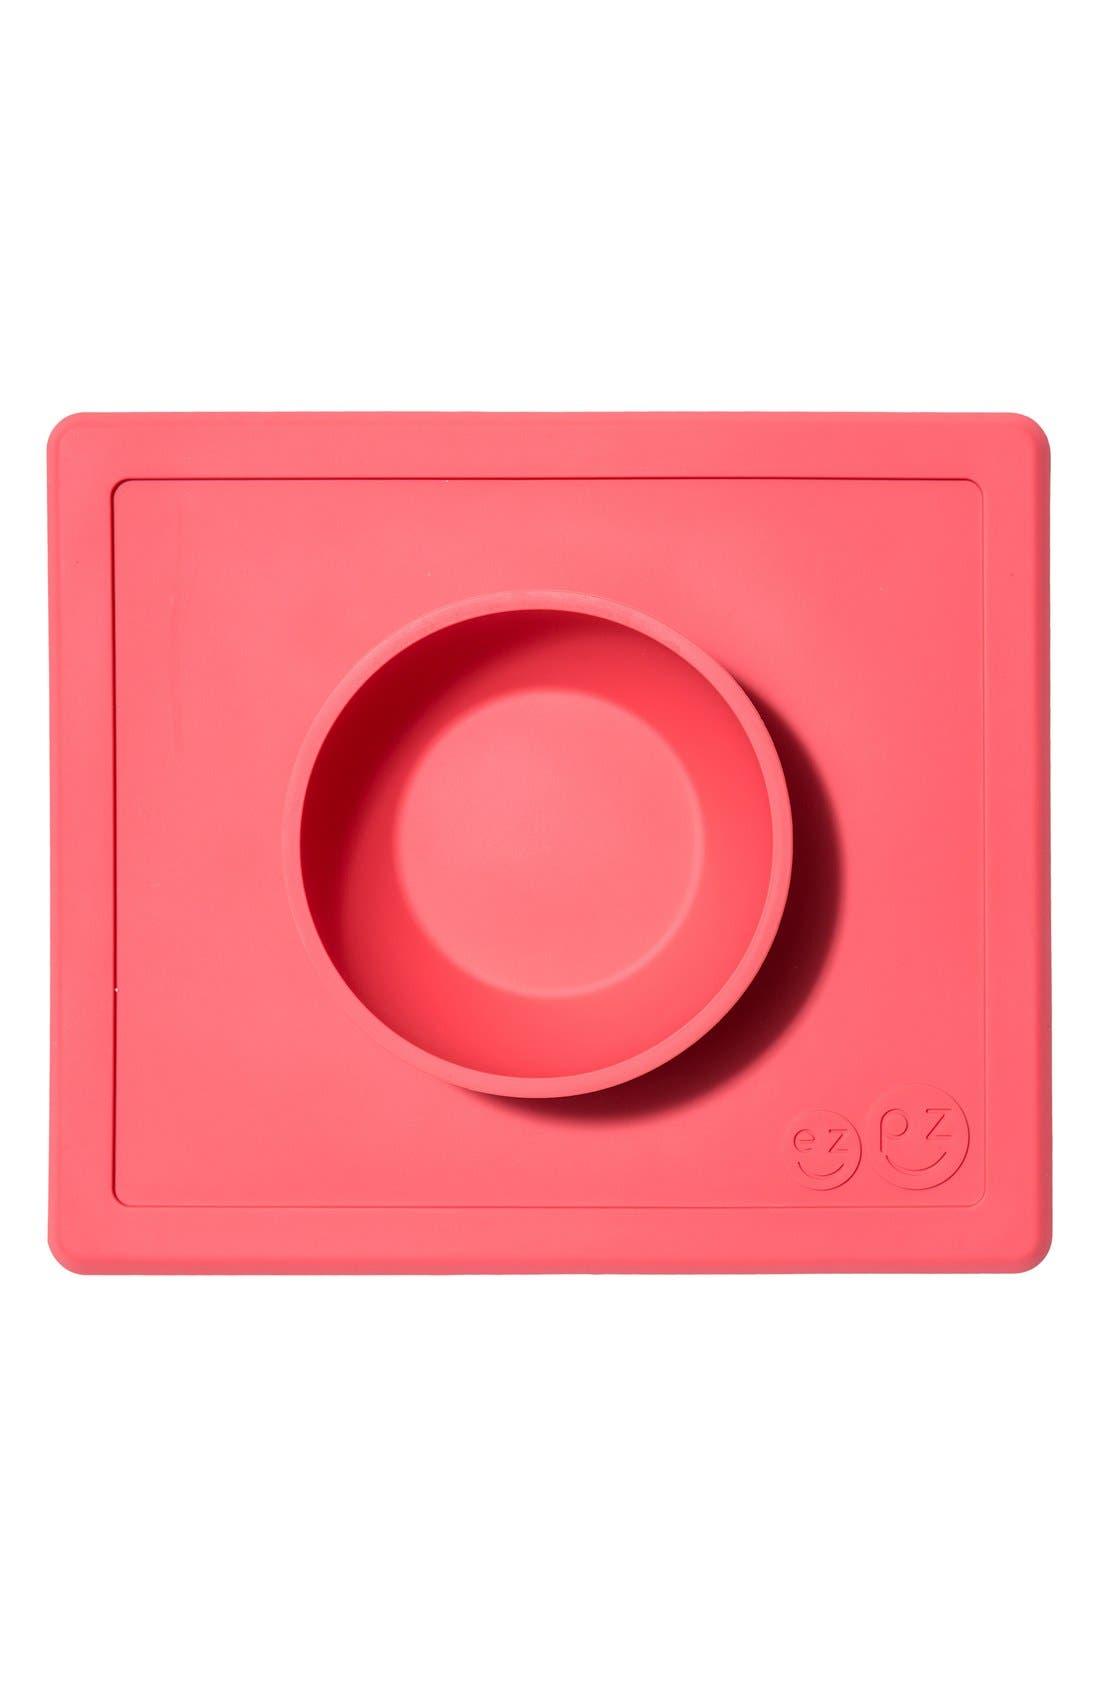 Main Image - ezpz 'Happy Bowl' Silicone Feeding Mat